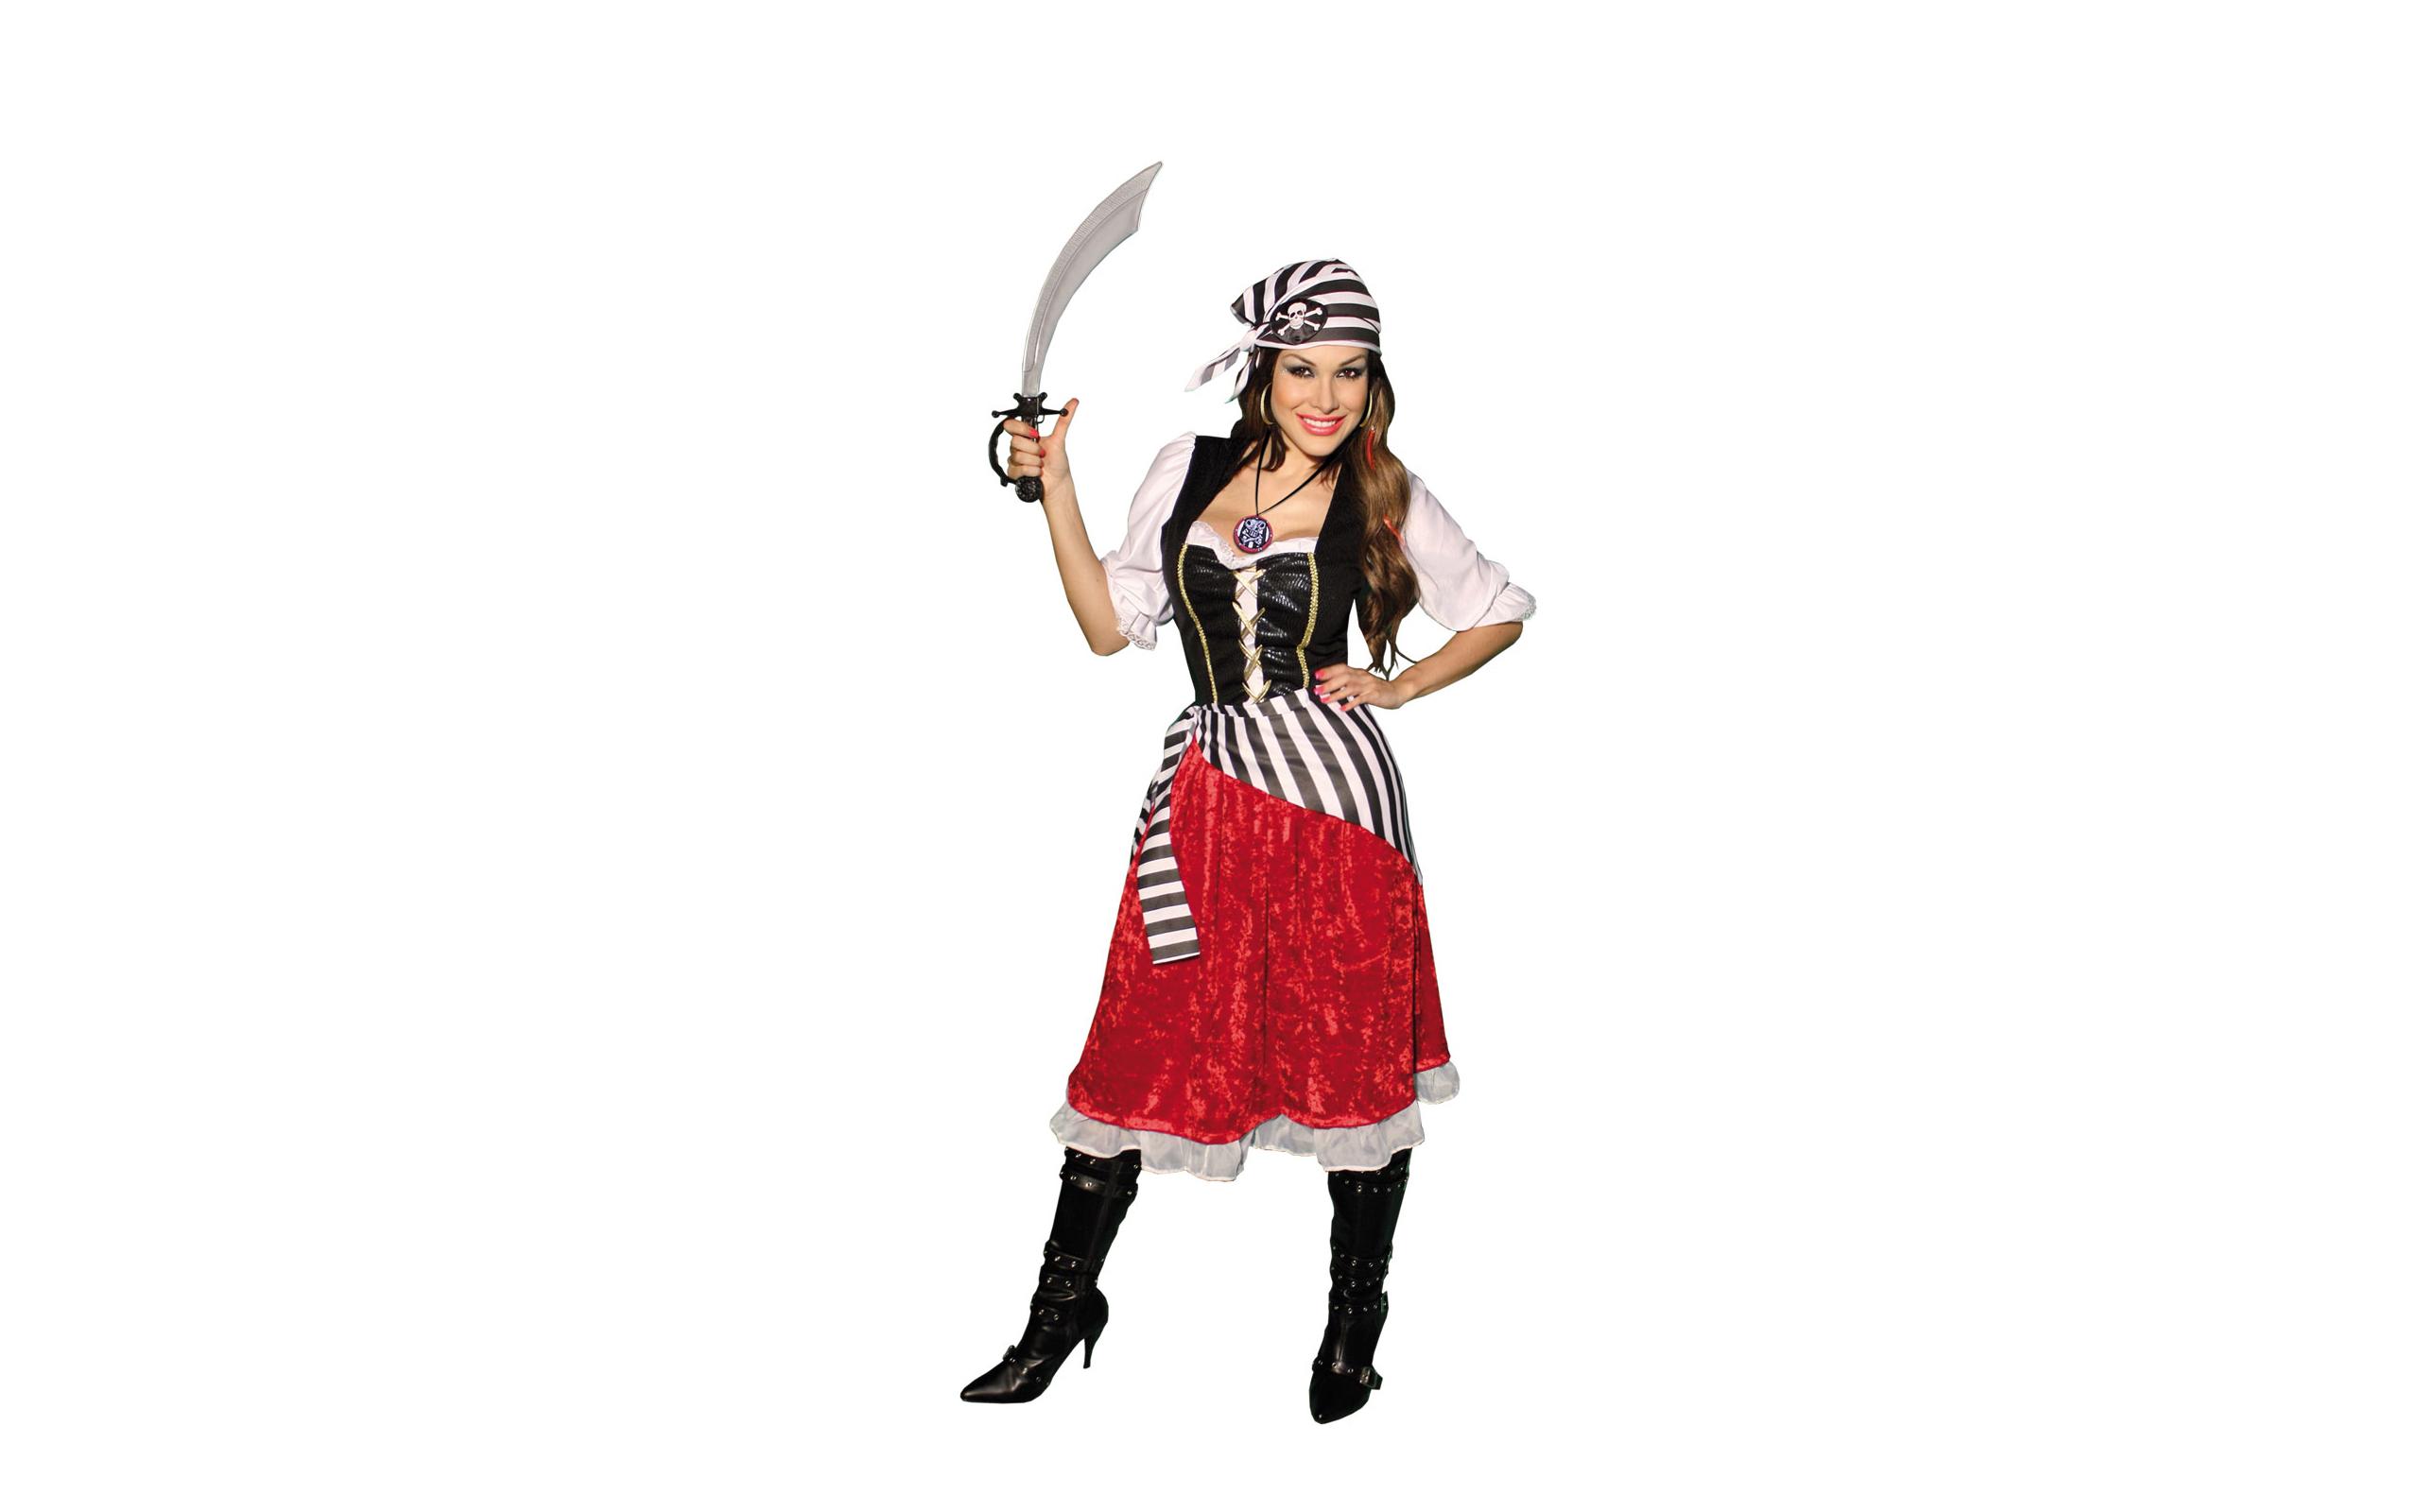 Mujer pirata - 2560x1600